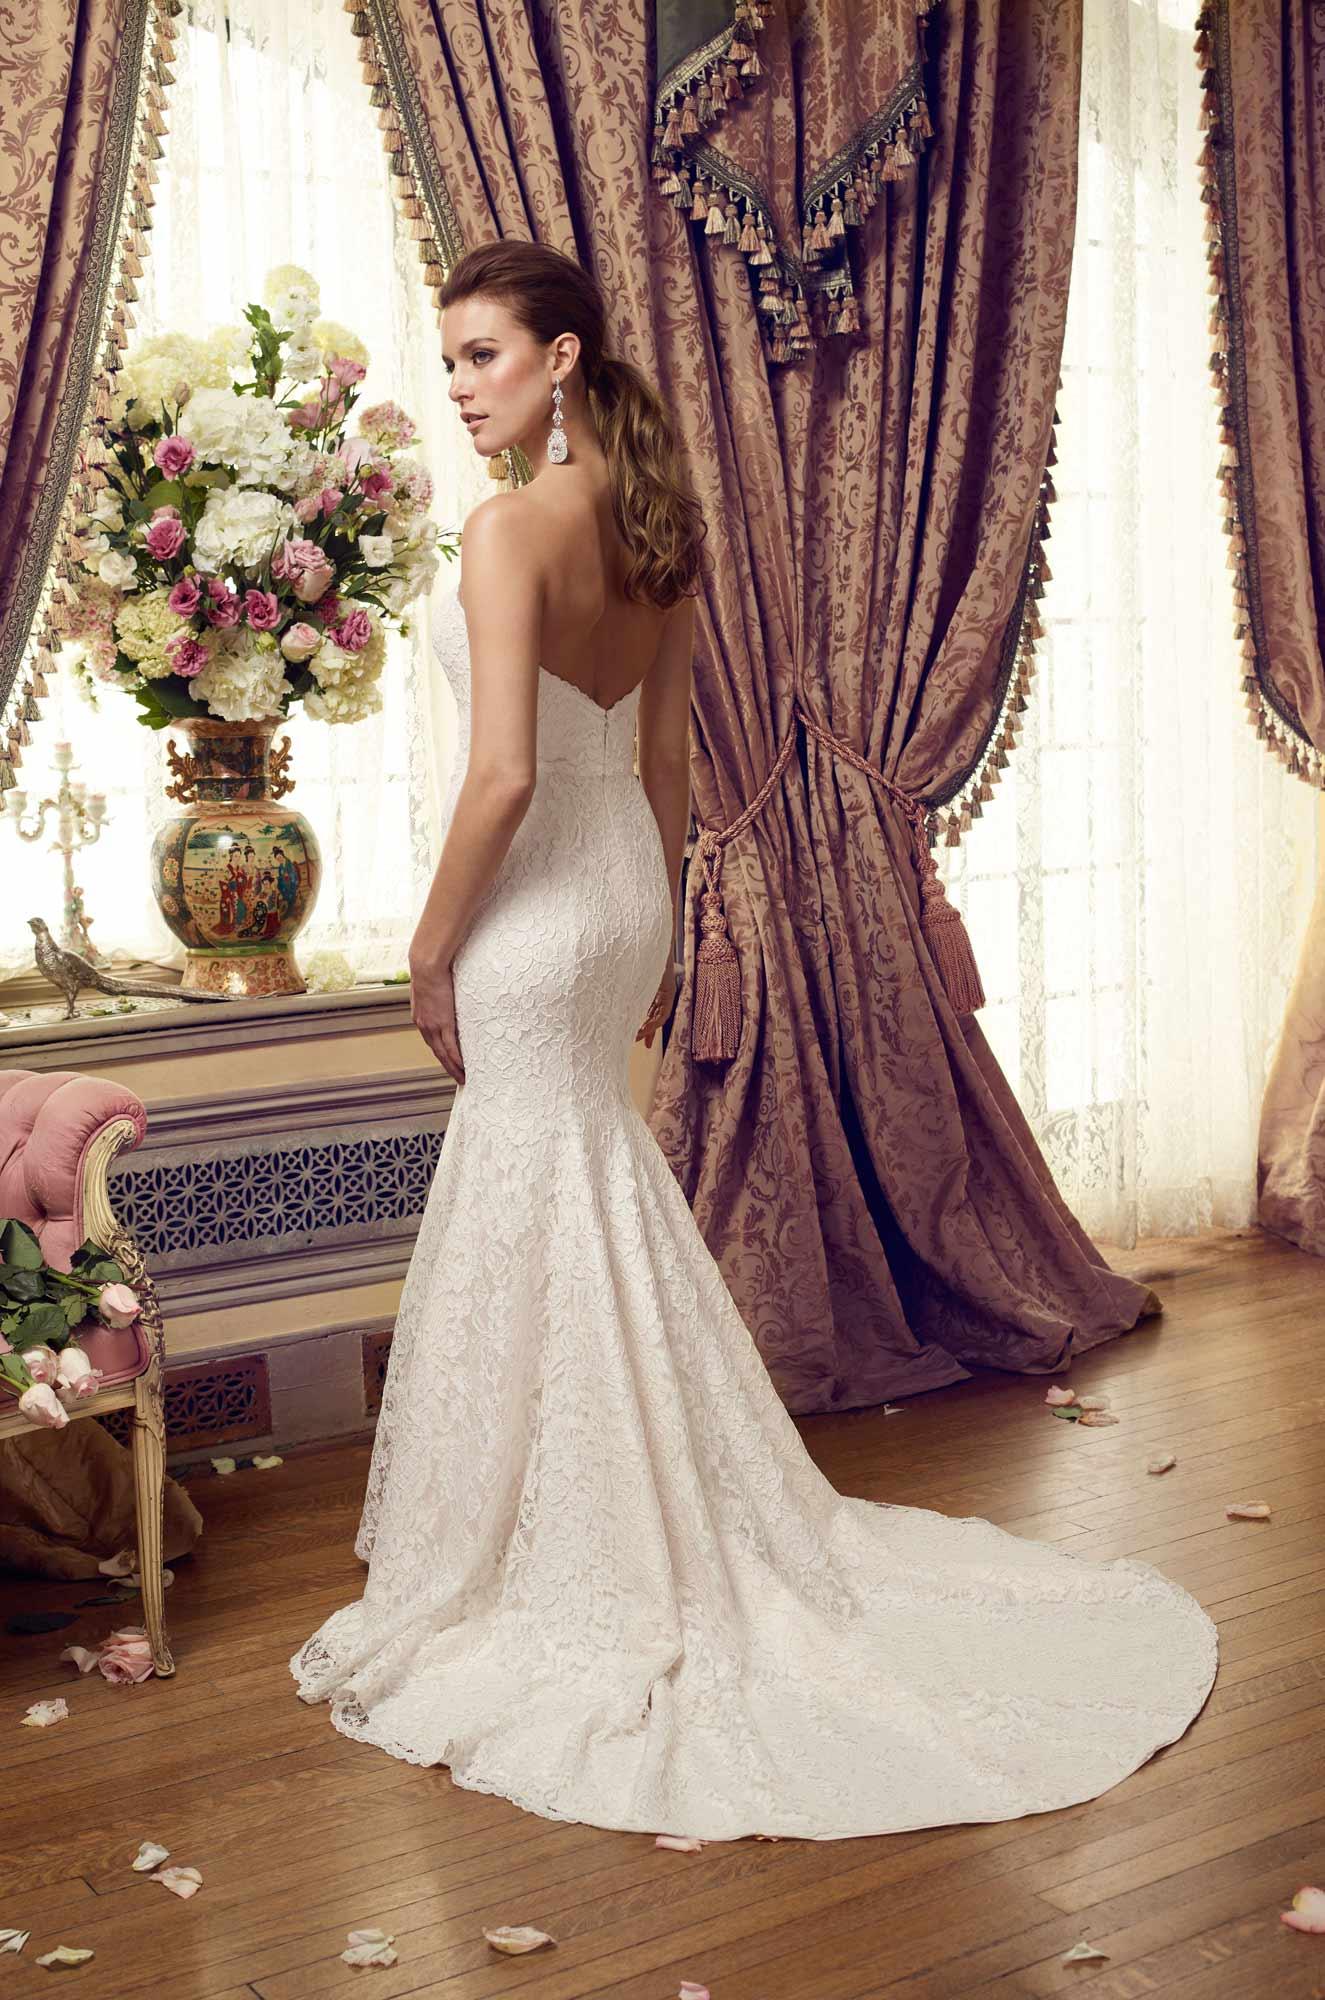 Ethereal Skirt Wedding Dress - Style #2152 | Mikaella Bridal